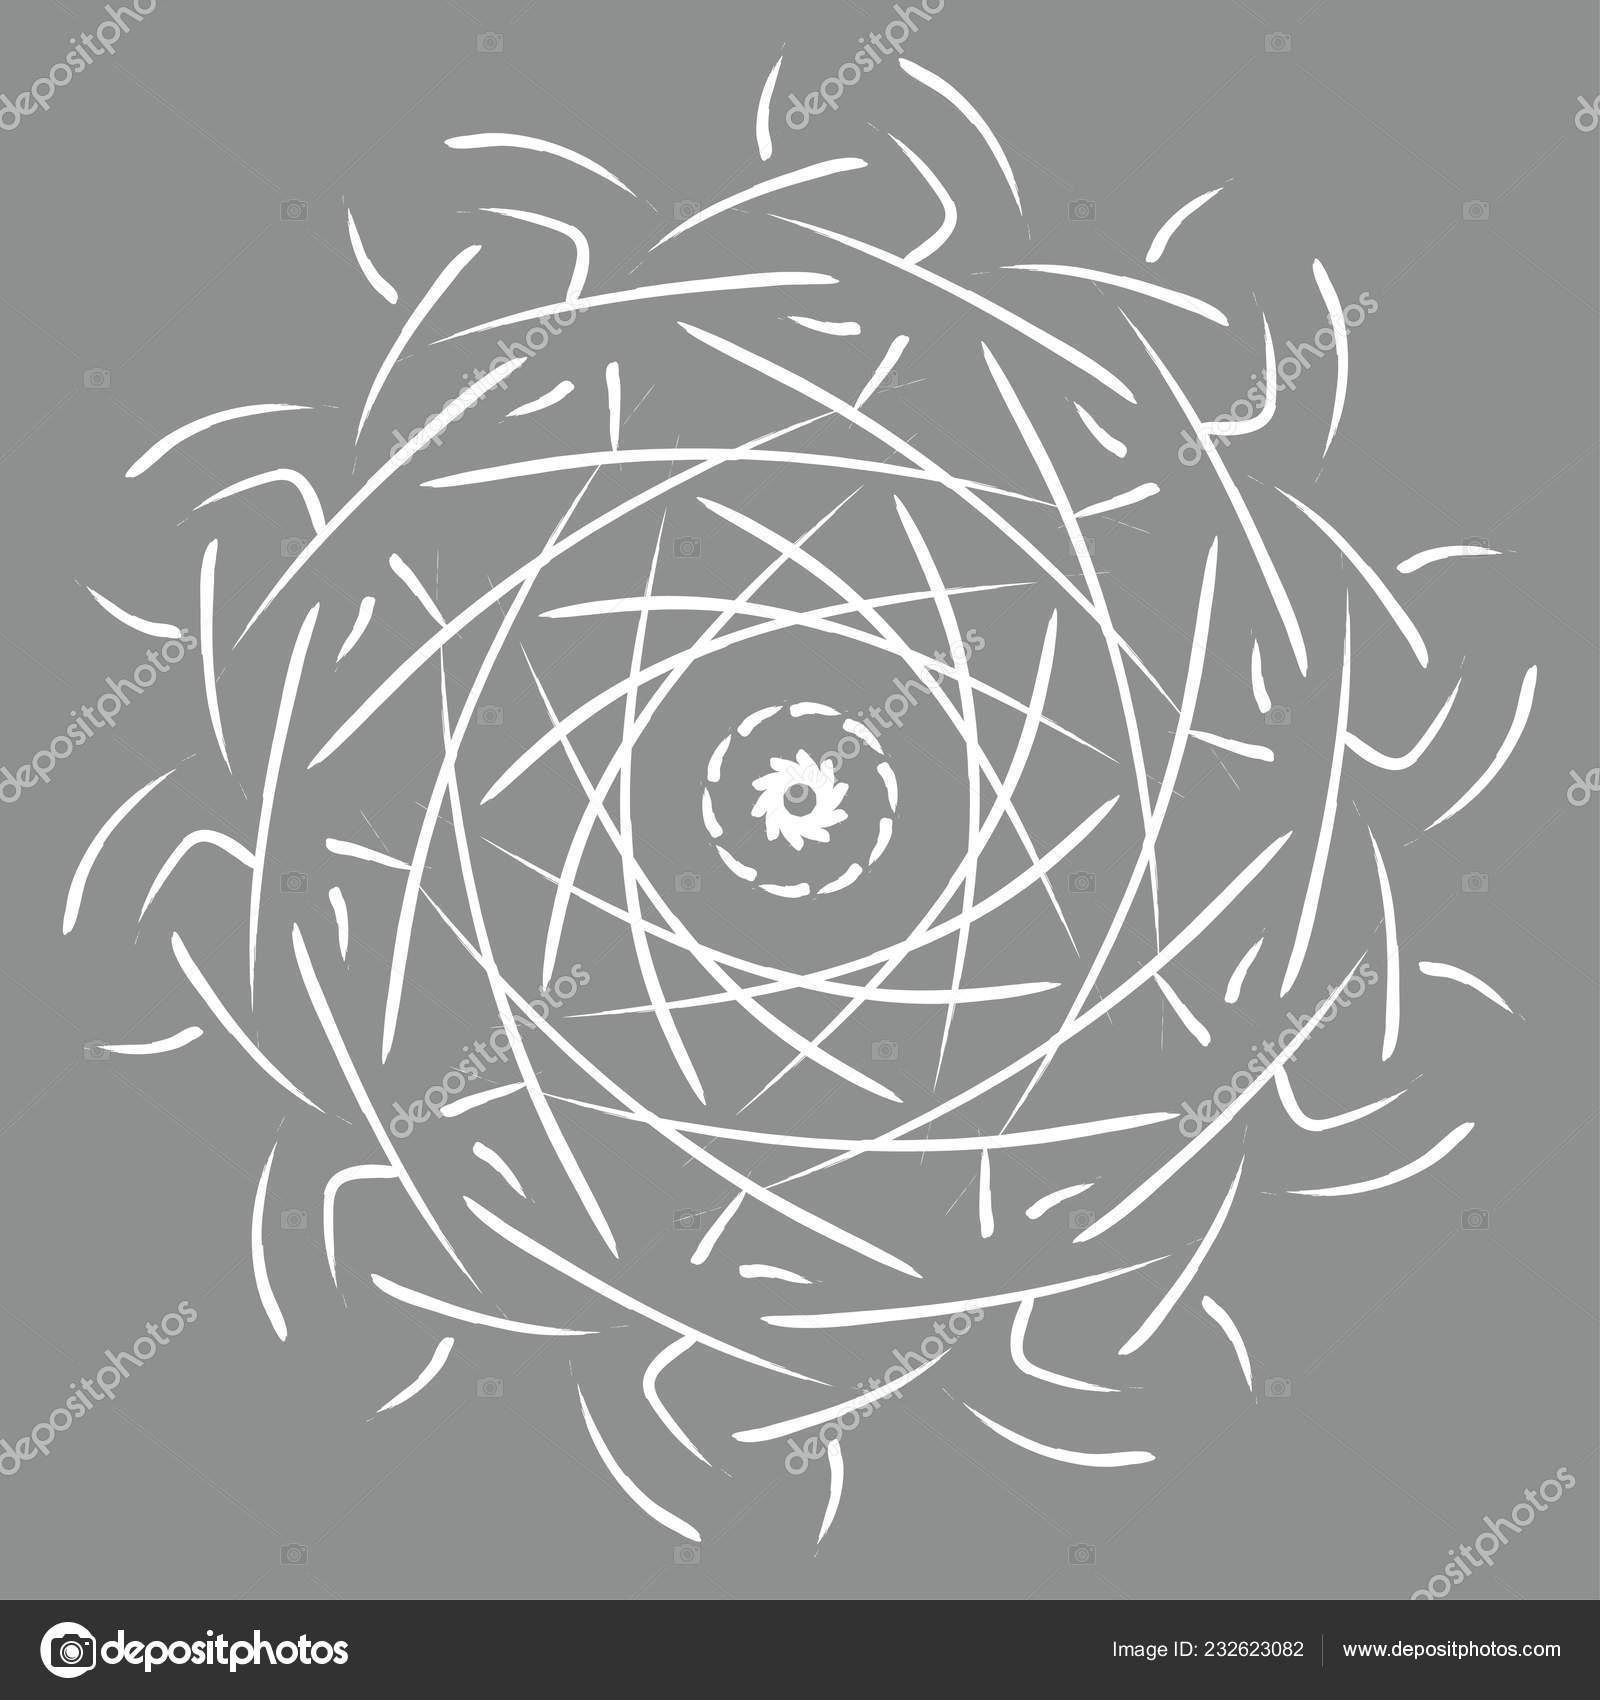 Kleurplaten Volwassenen Abstract.Mandala Illustratie Kleurplaten Voor Volwassenen Ronde